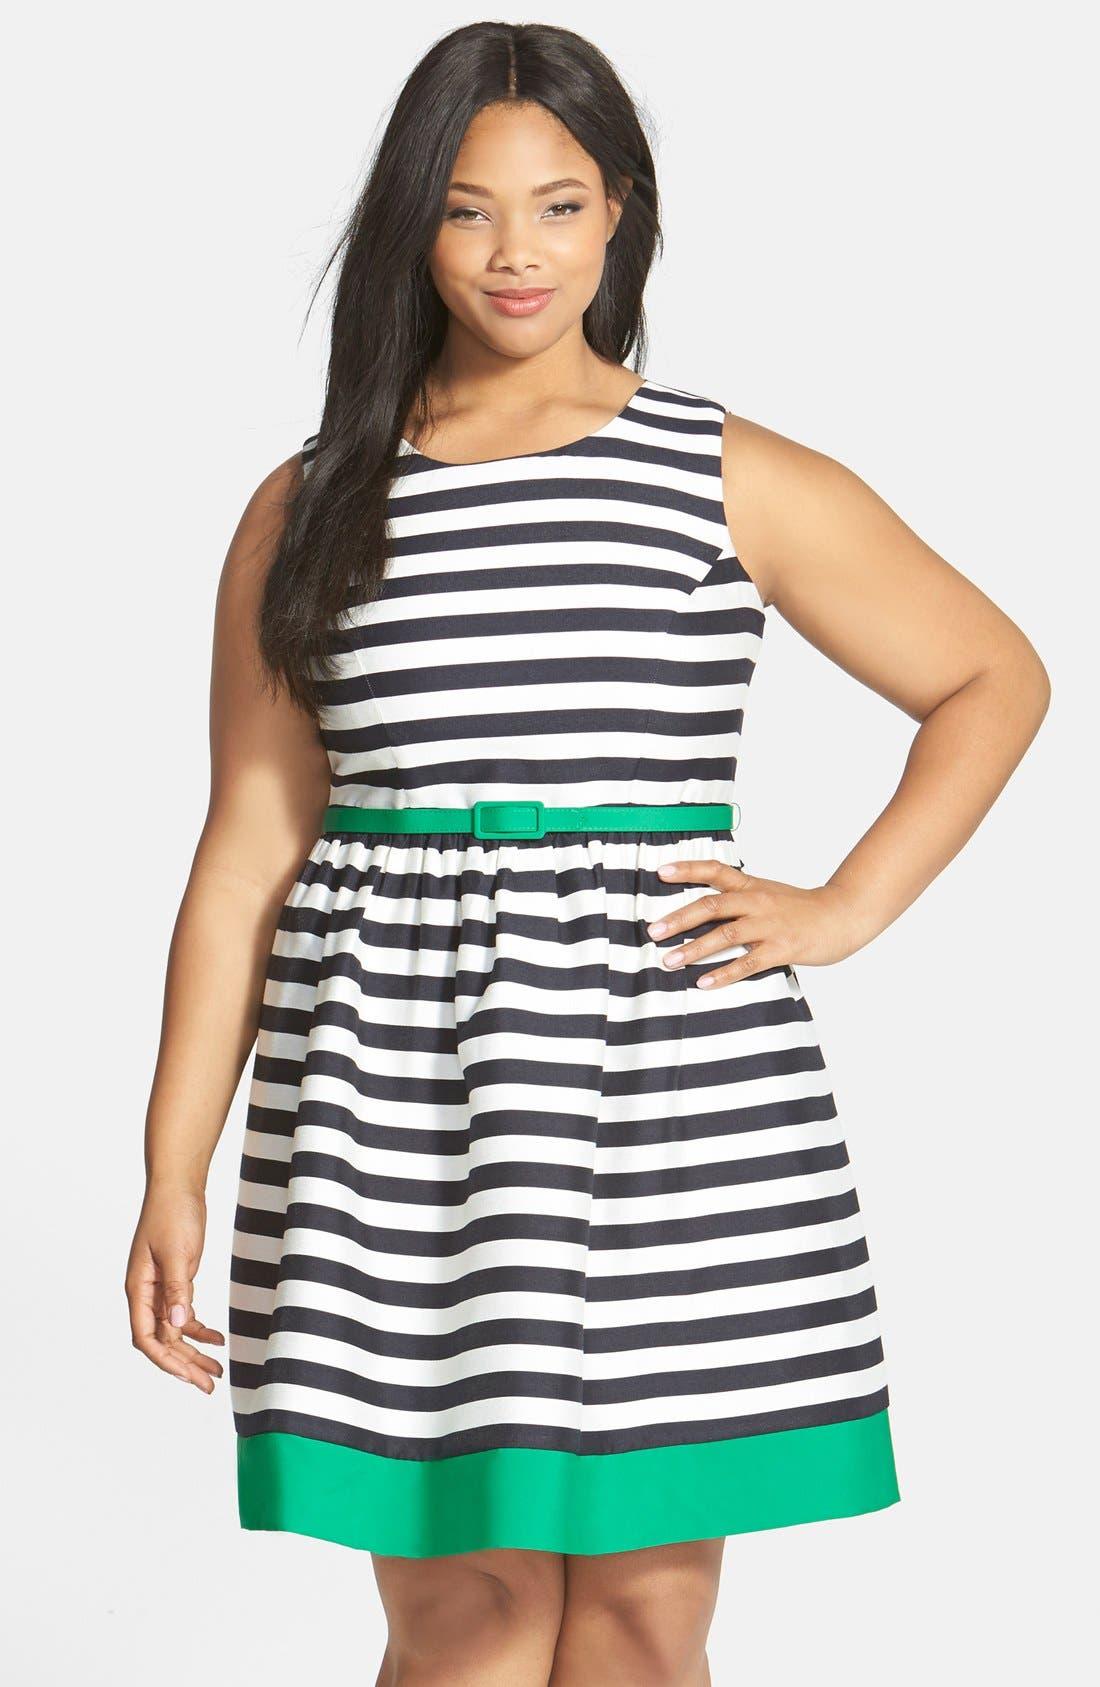 Alternate Image 1 Selected - Eliza J Contrast Trim Stripe Jacquard Fit & Flare Dress (Plus Size)